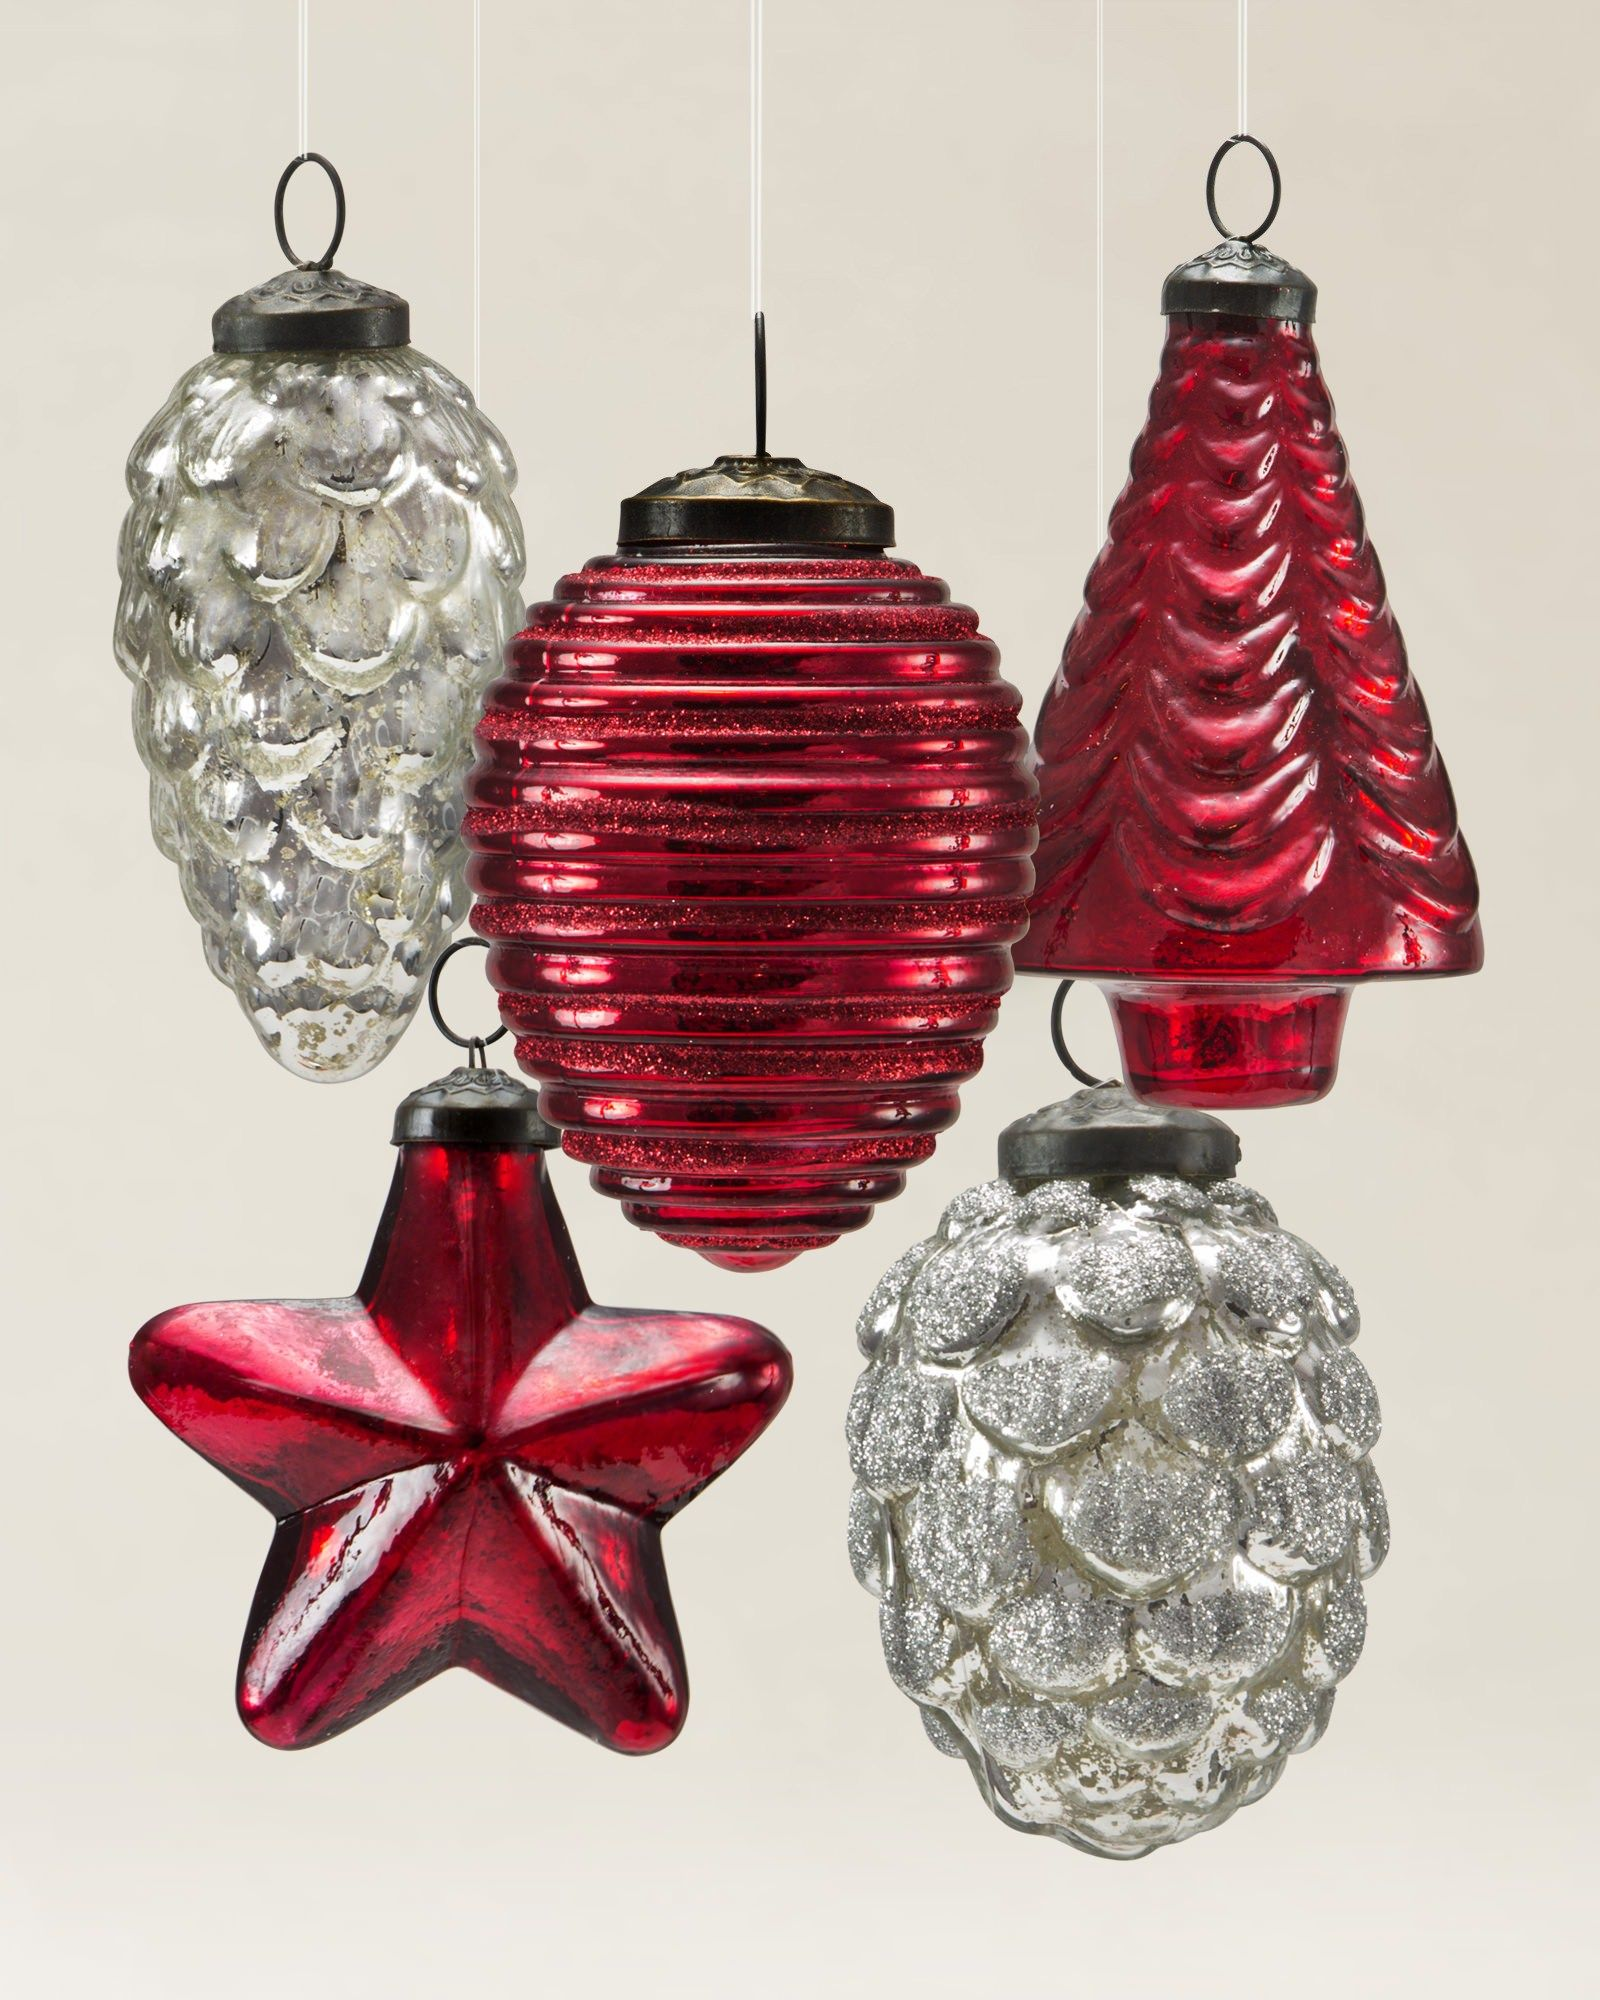 Mercury glass ornaments balsam hill christmas inspires